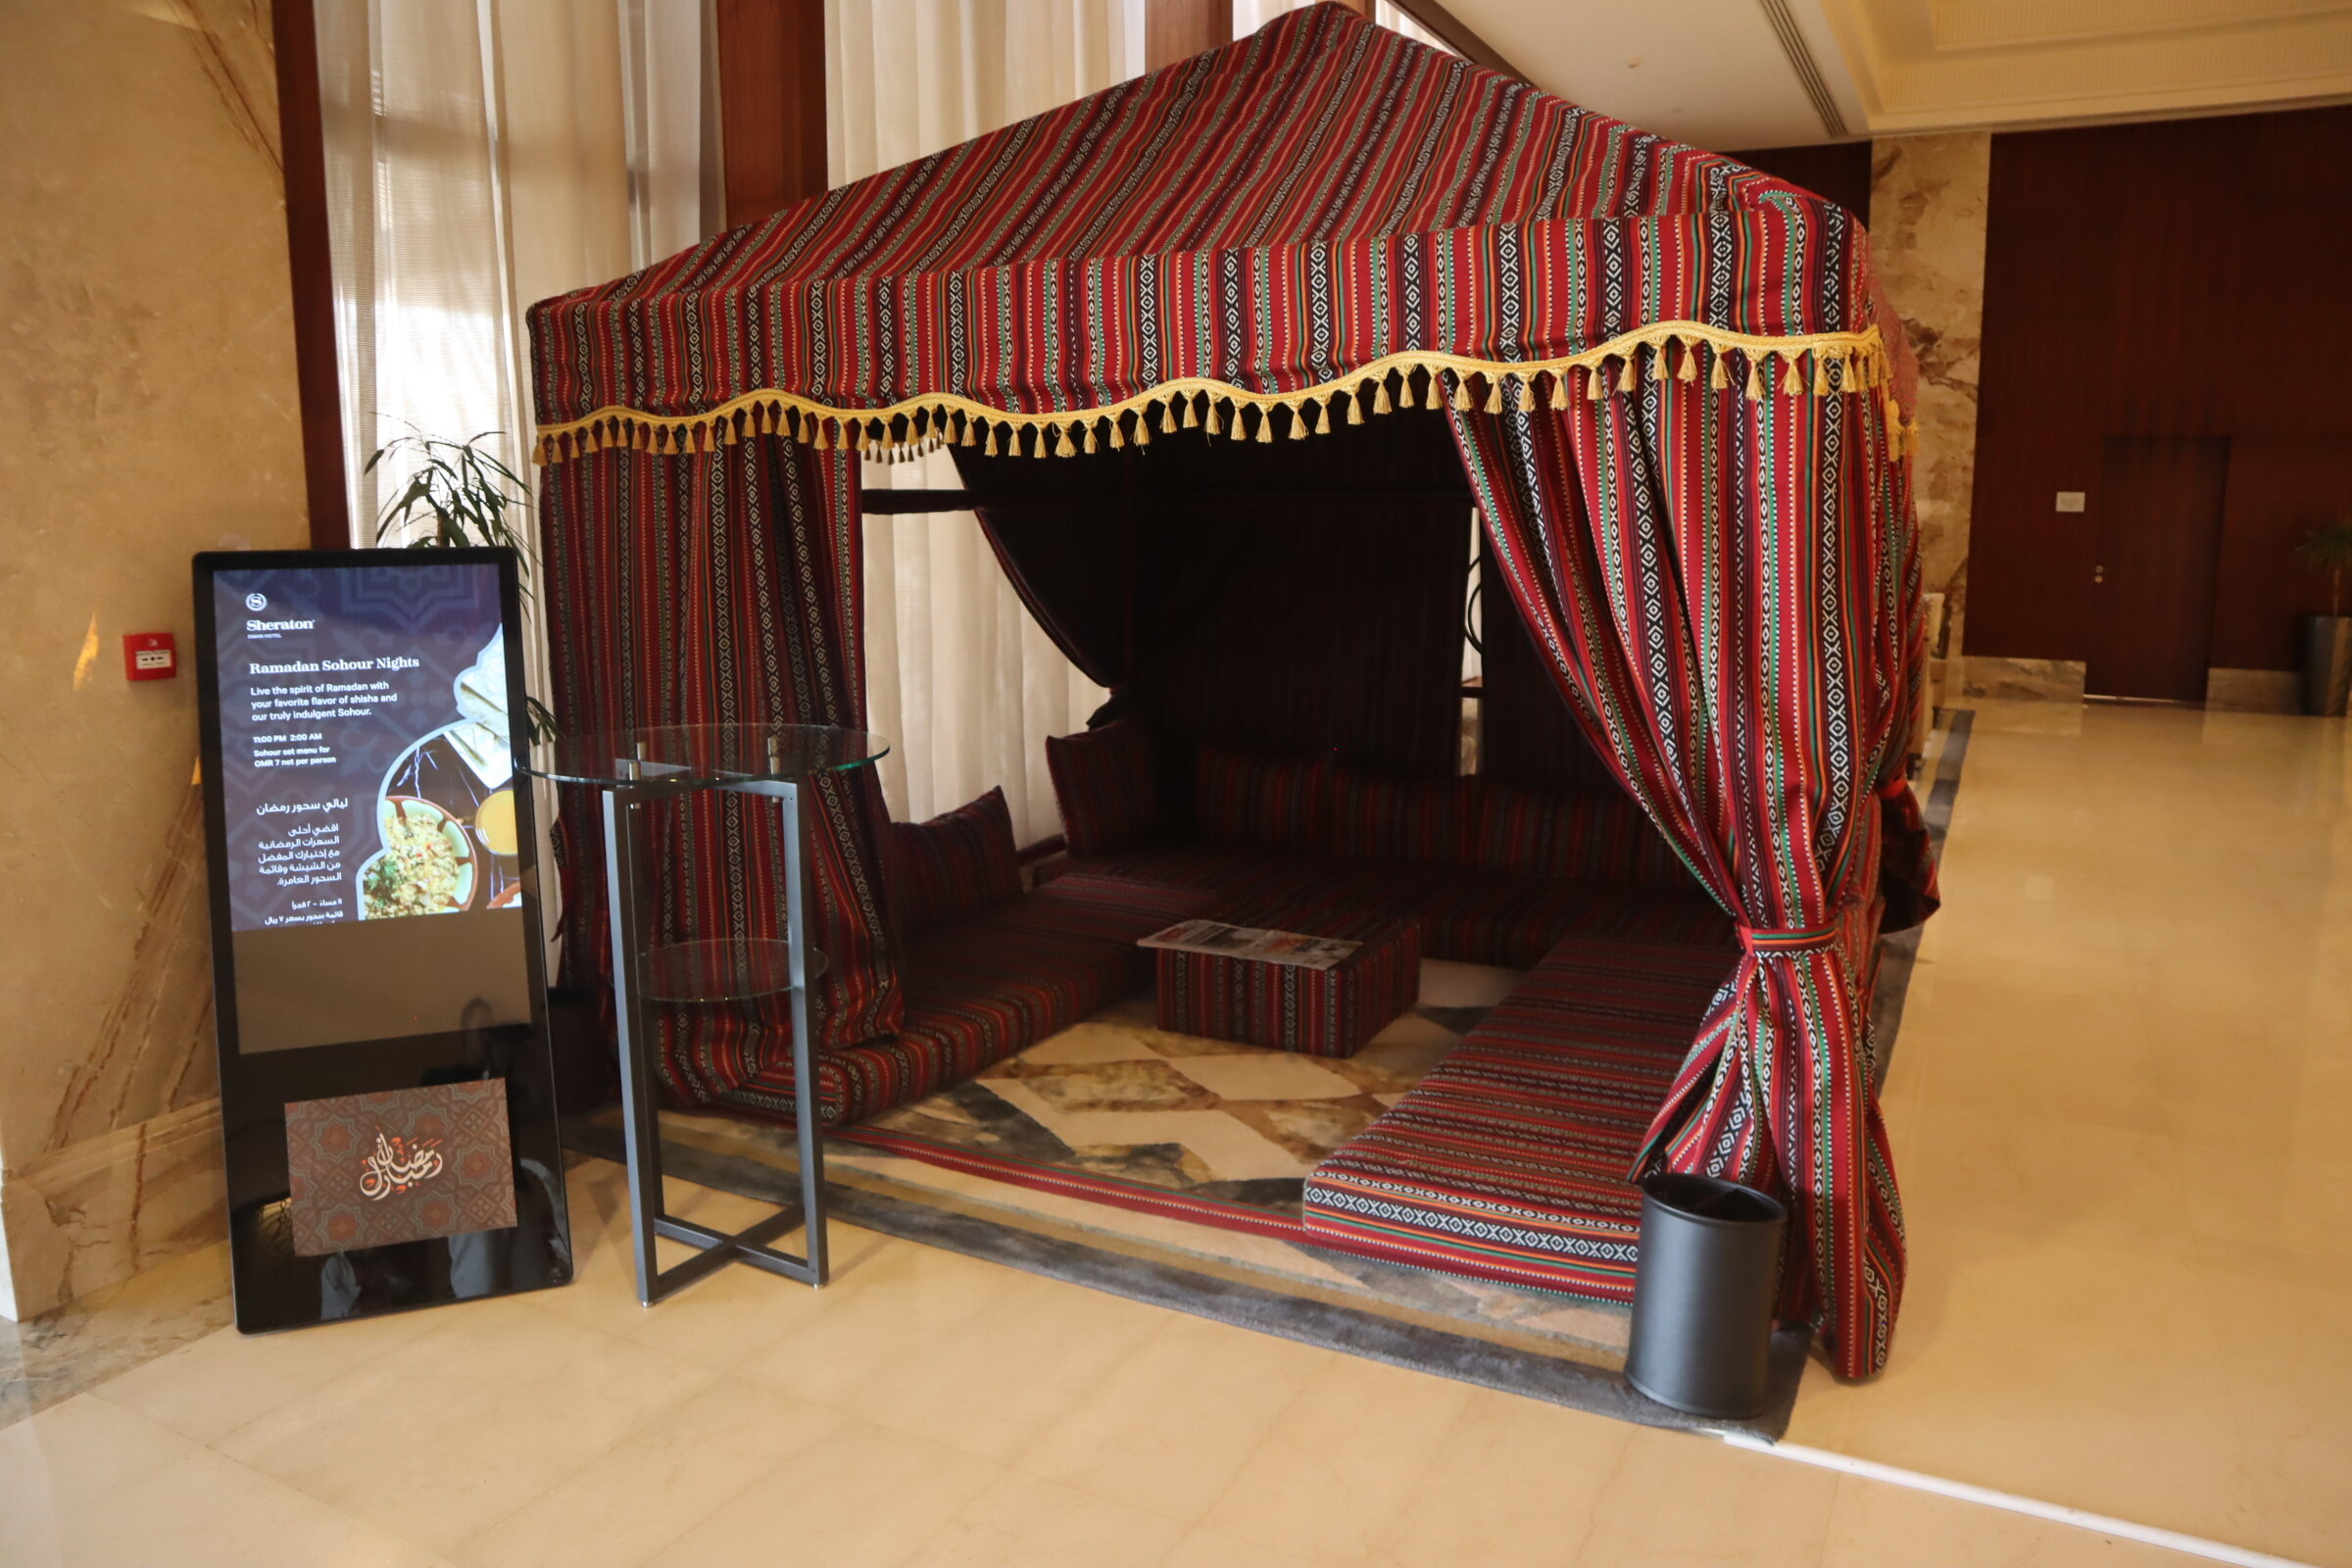 Sheraton Oman – Bedouin tent